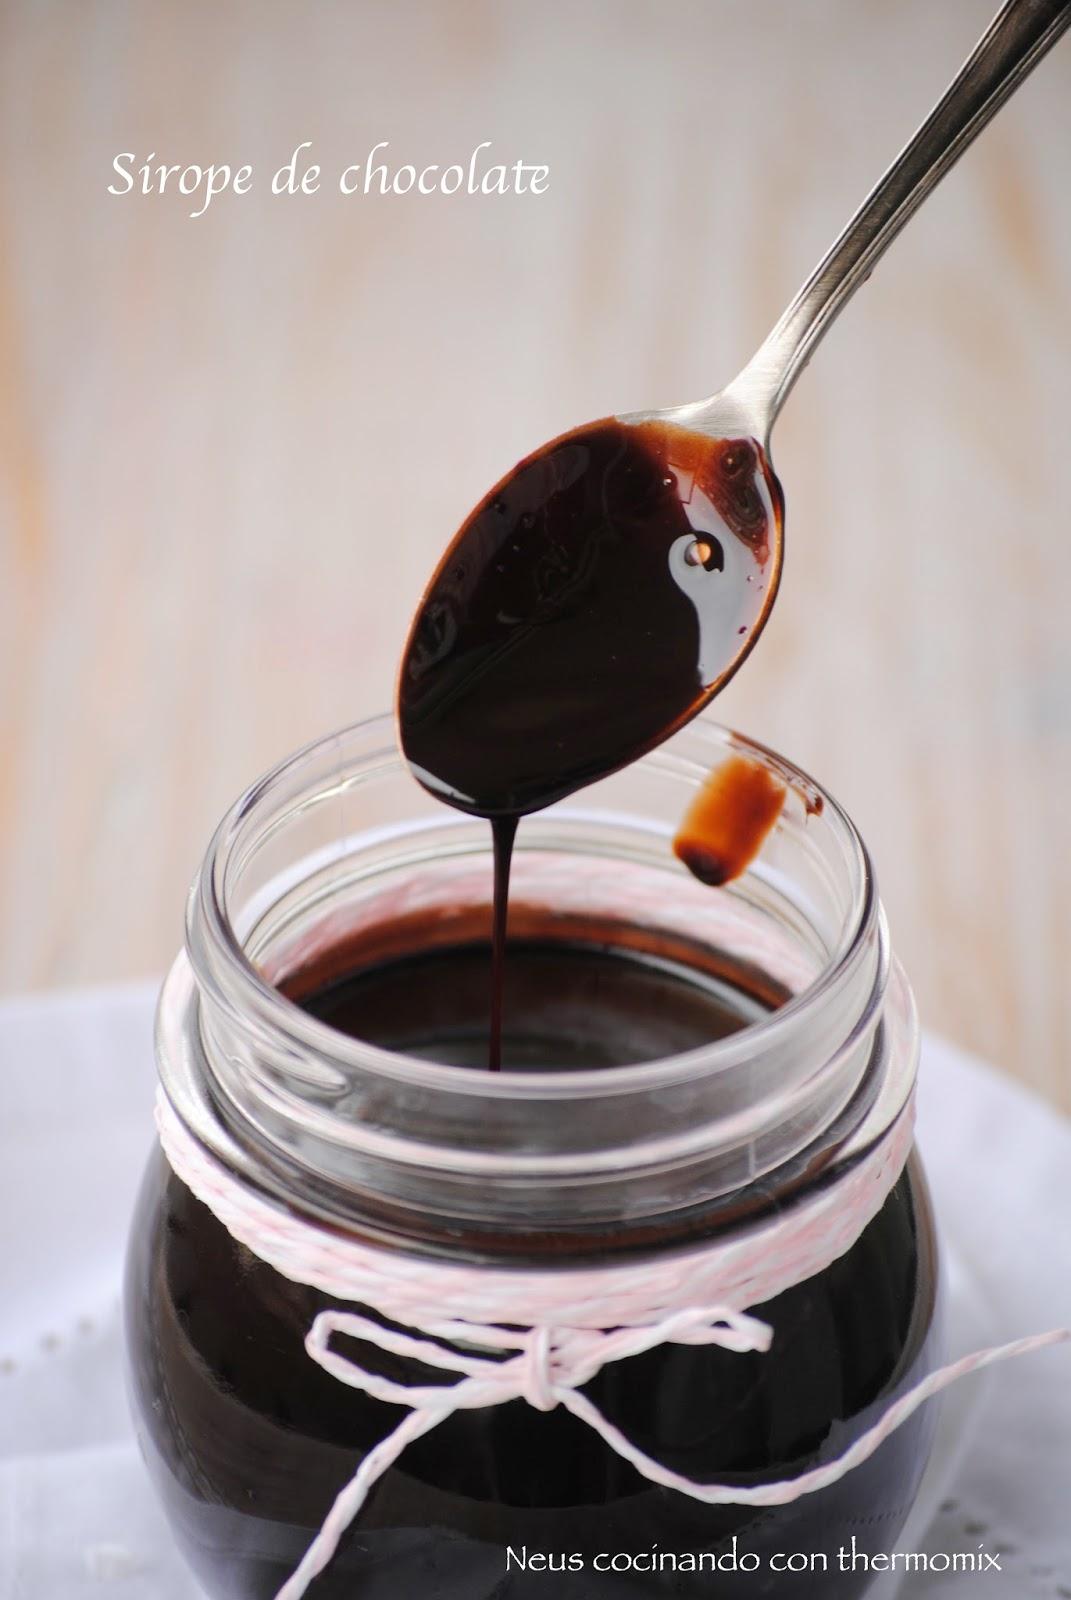 Sirope de chocolate-neus-cocinando-con-thermomix